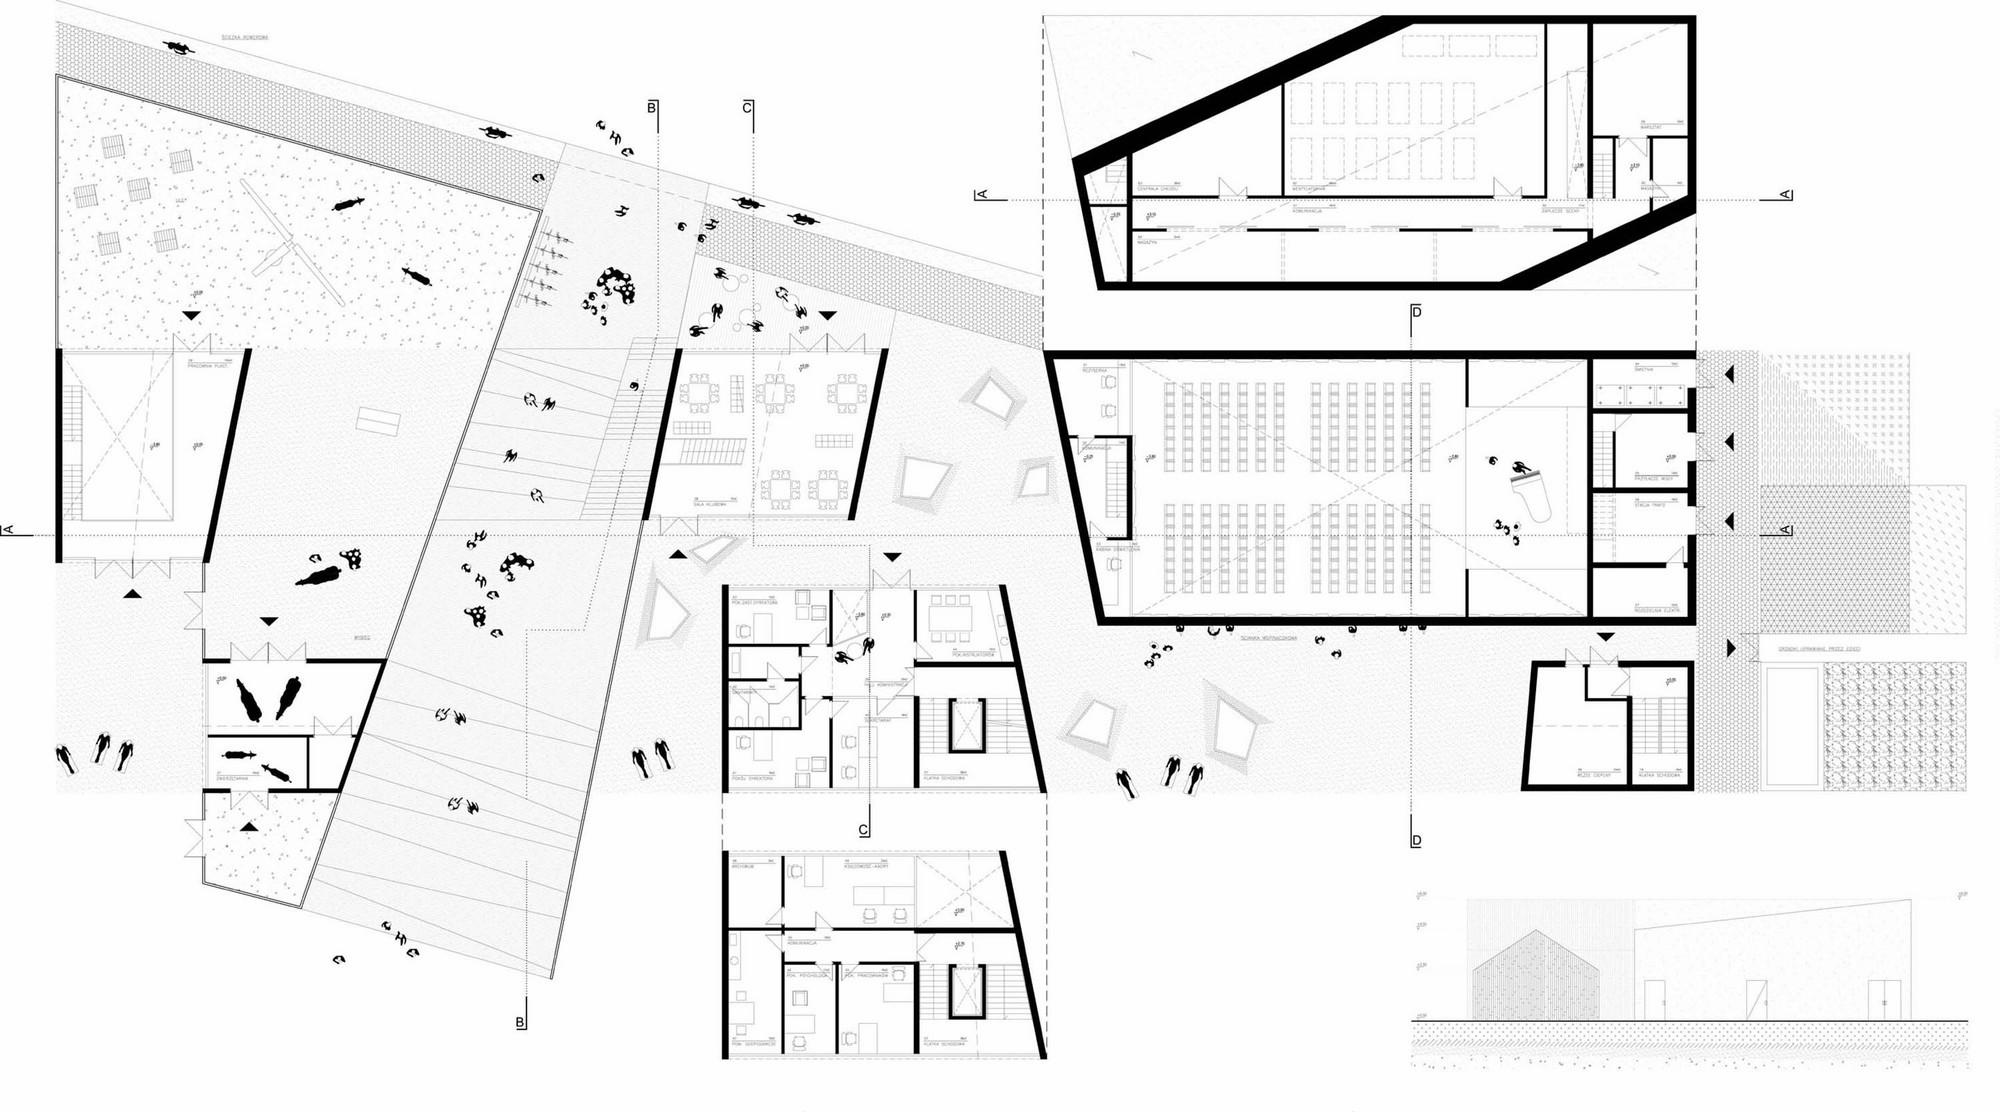 medium resolution of sluzewski culture centre wwaa 307kilo